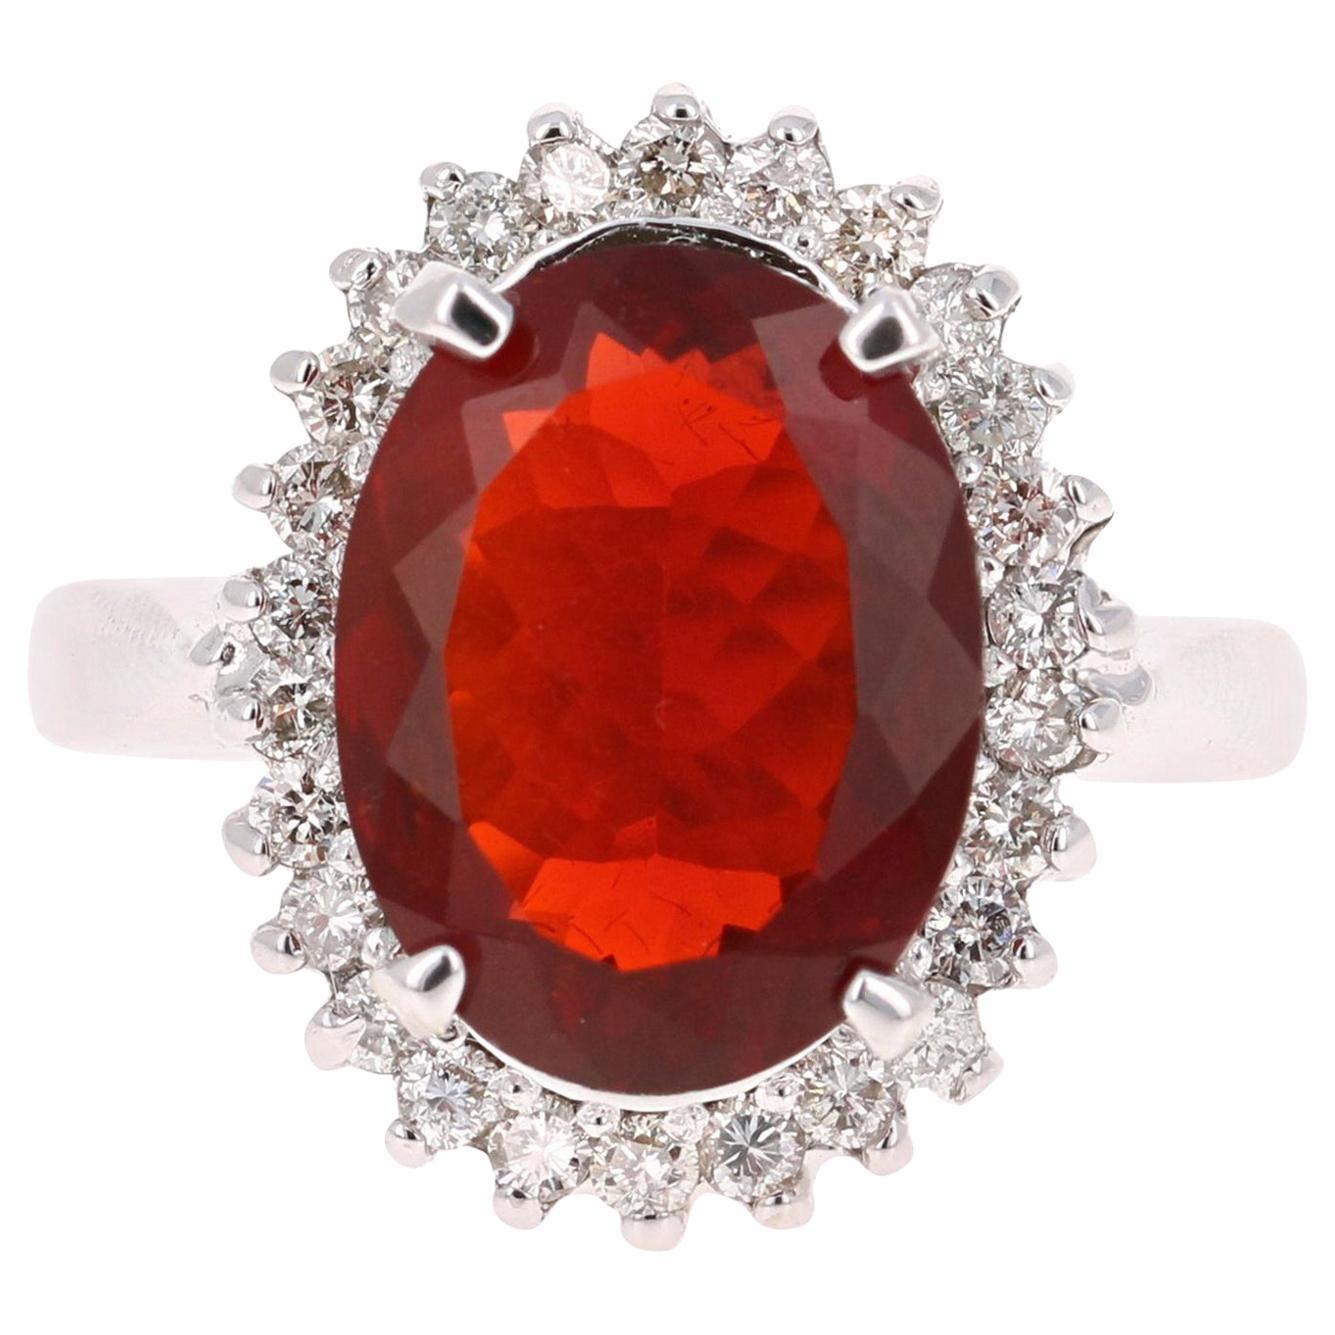 3.94 Carat Fire Opal Diamond 14 Karat White Gold Ring